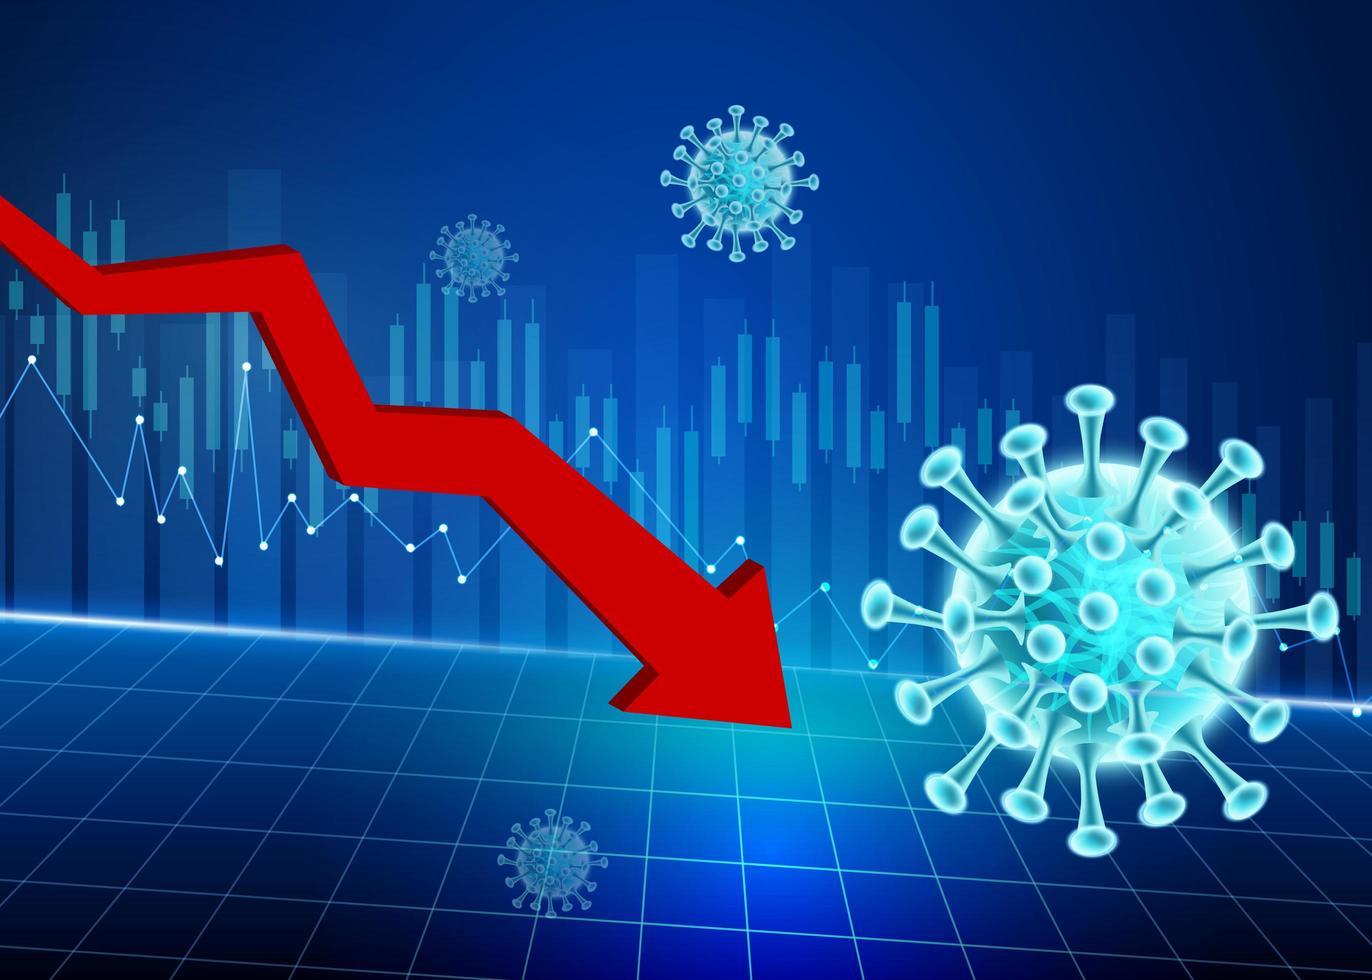 Abwärtspfeil Coronavirus Aktienkursrückgang Design vektor